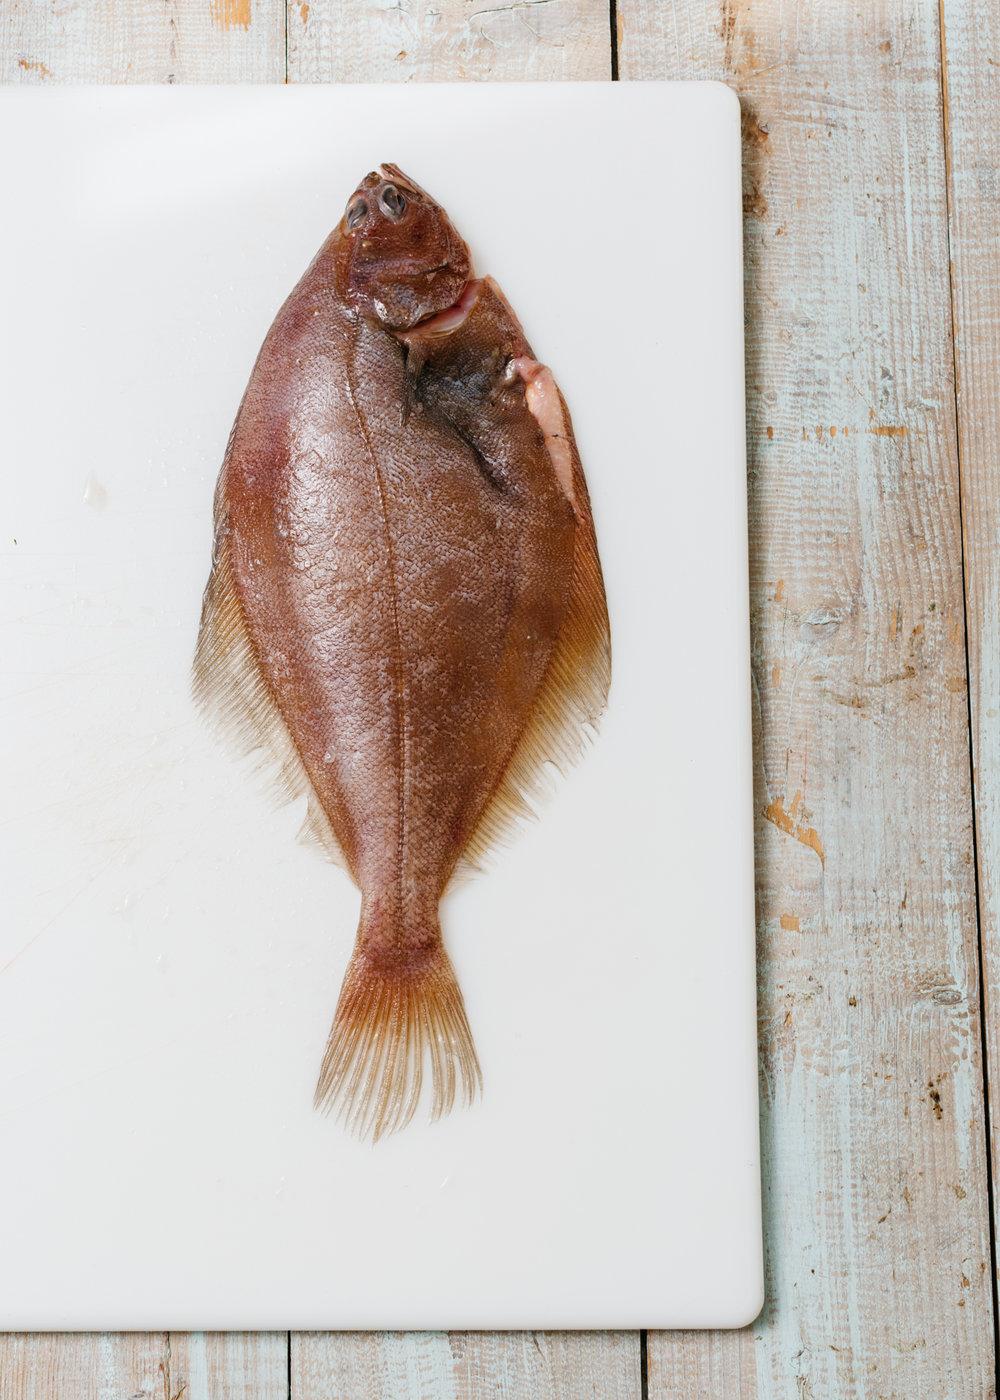 Flounder_Fennel-3472_WEB.jpg